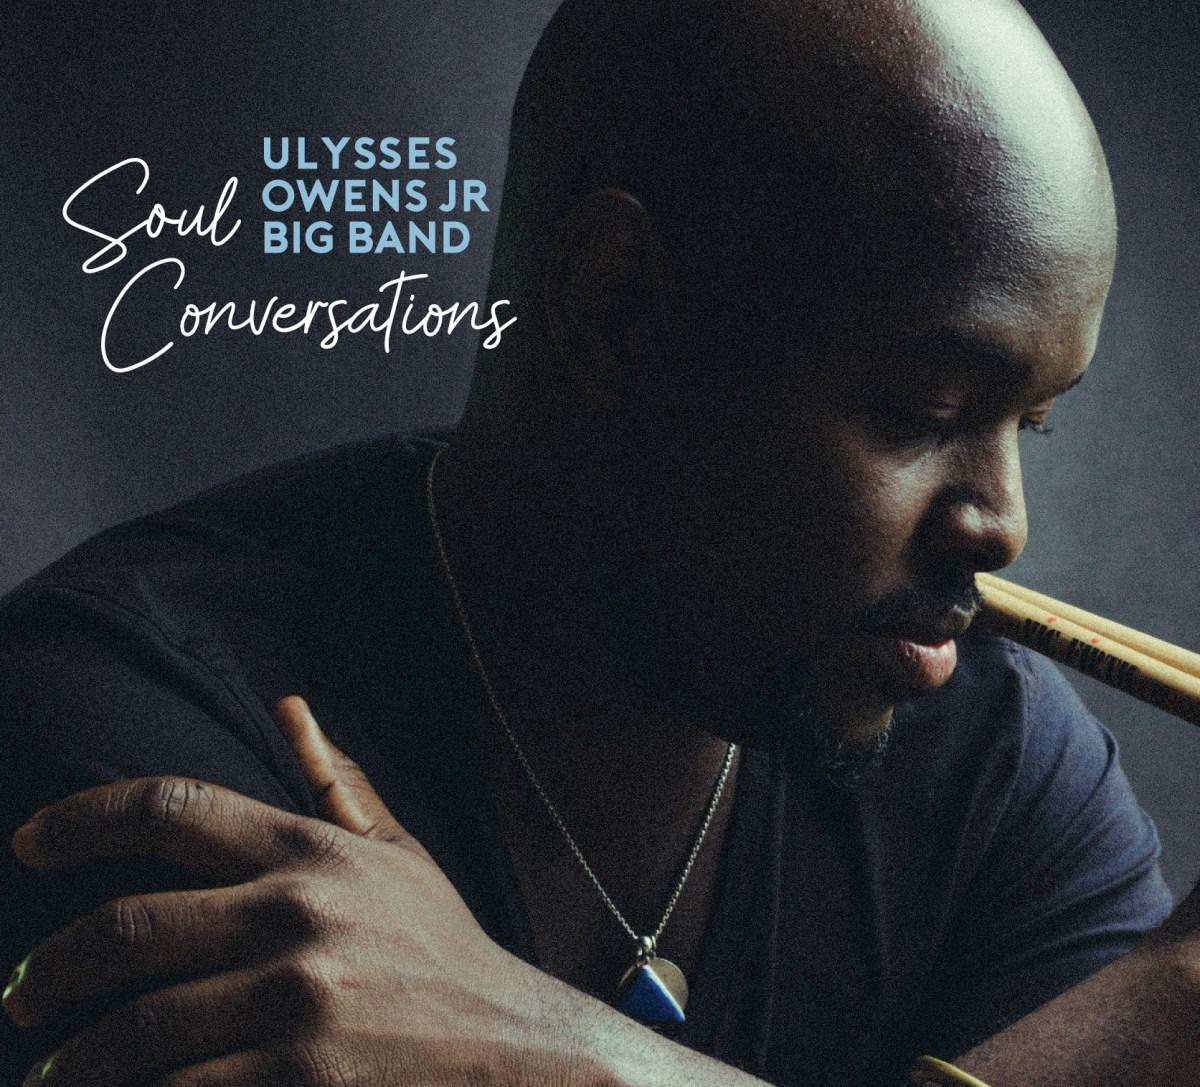 Cover Photo for Ulysses Owens Jr. new album Soul Conversations